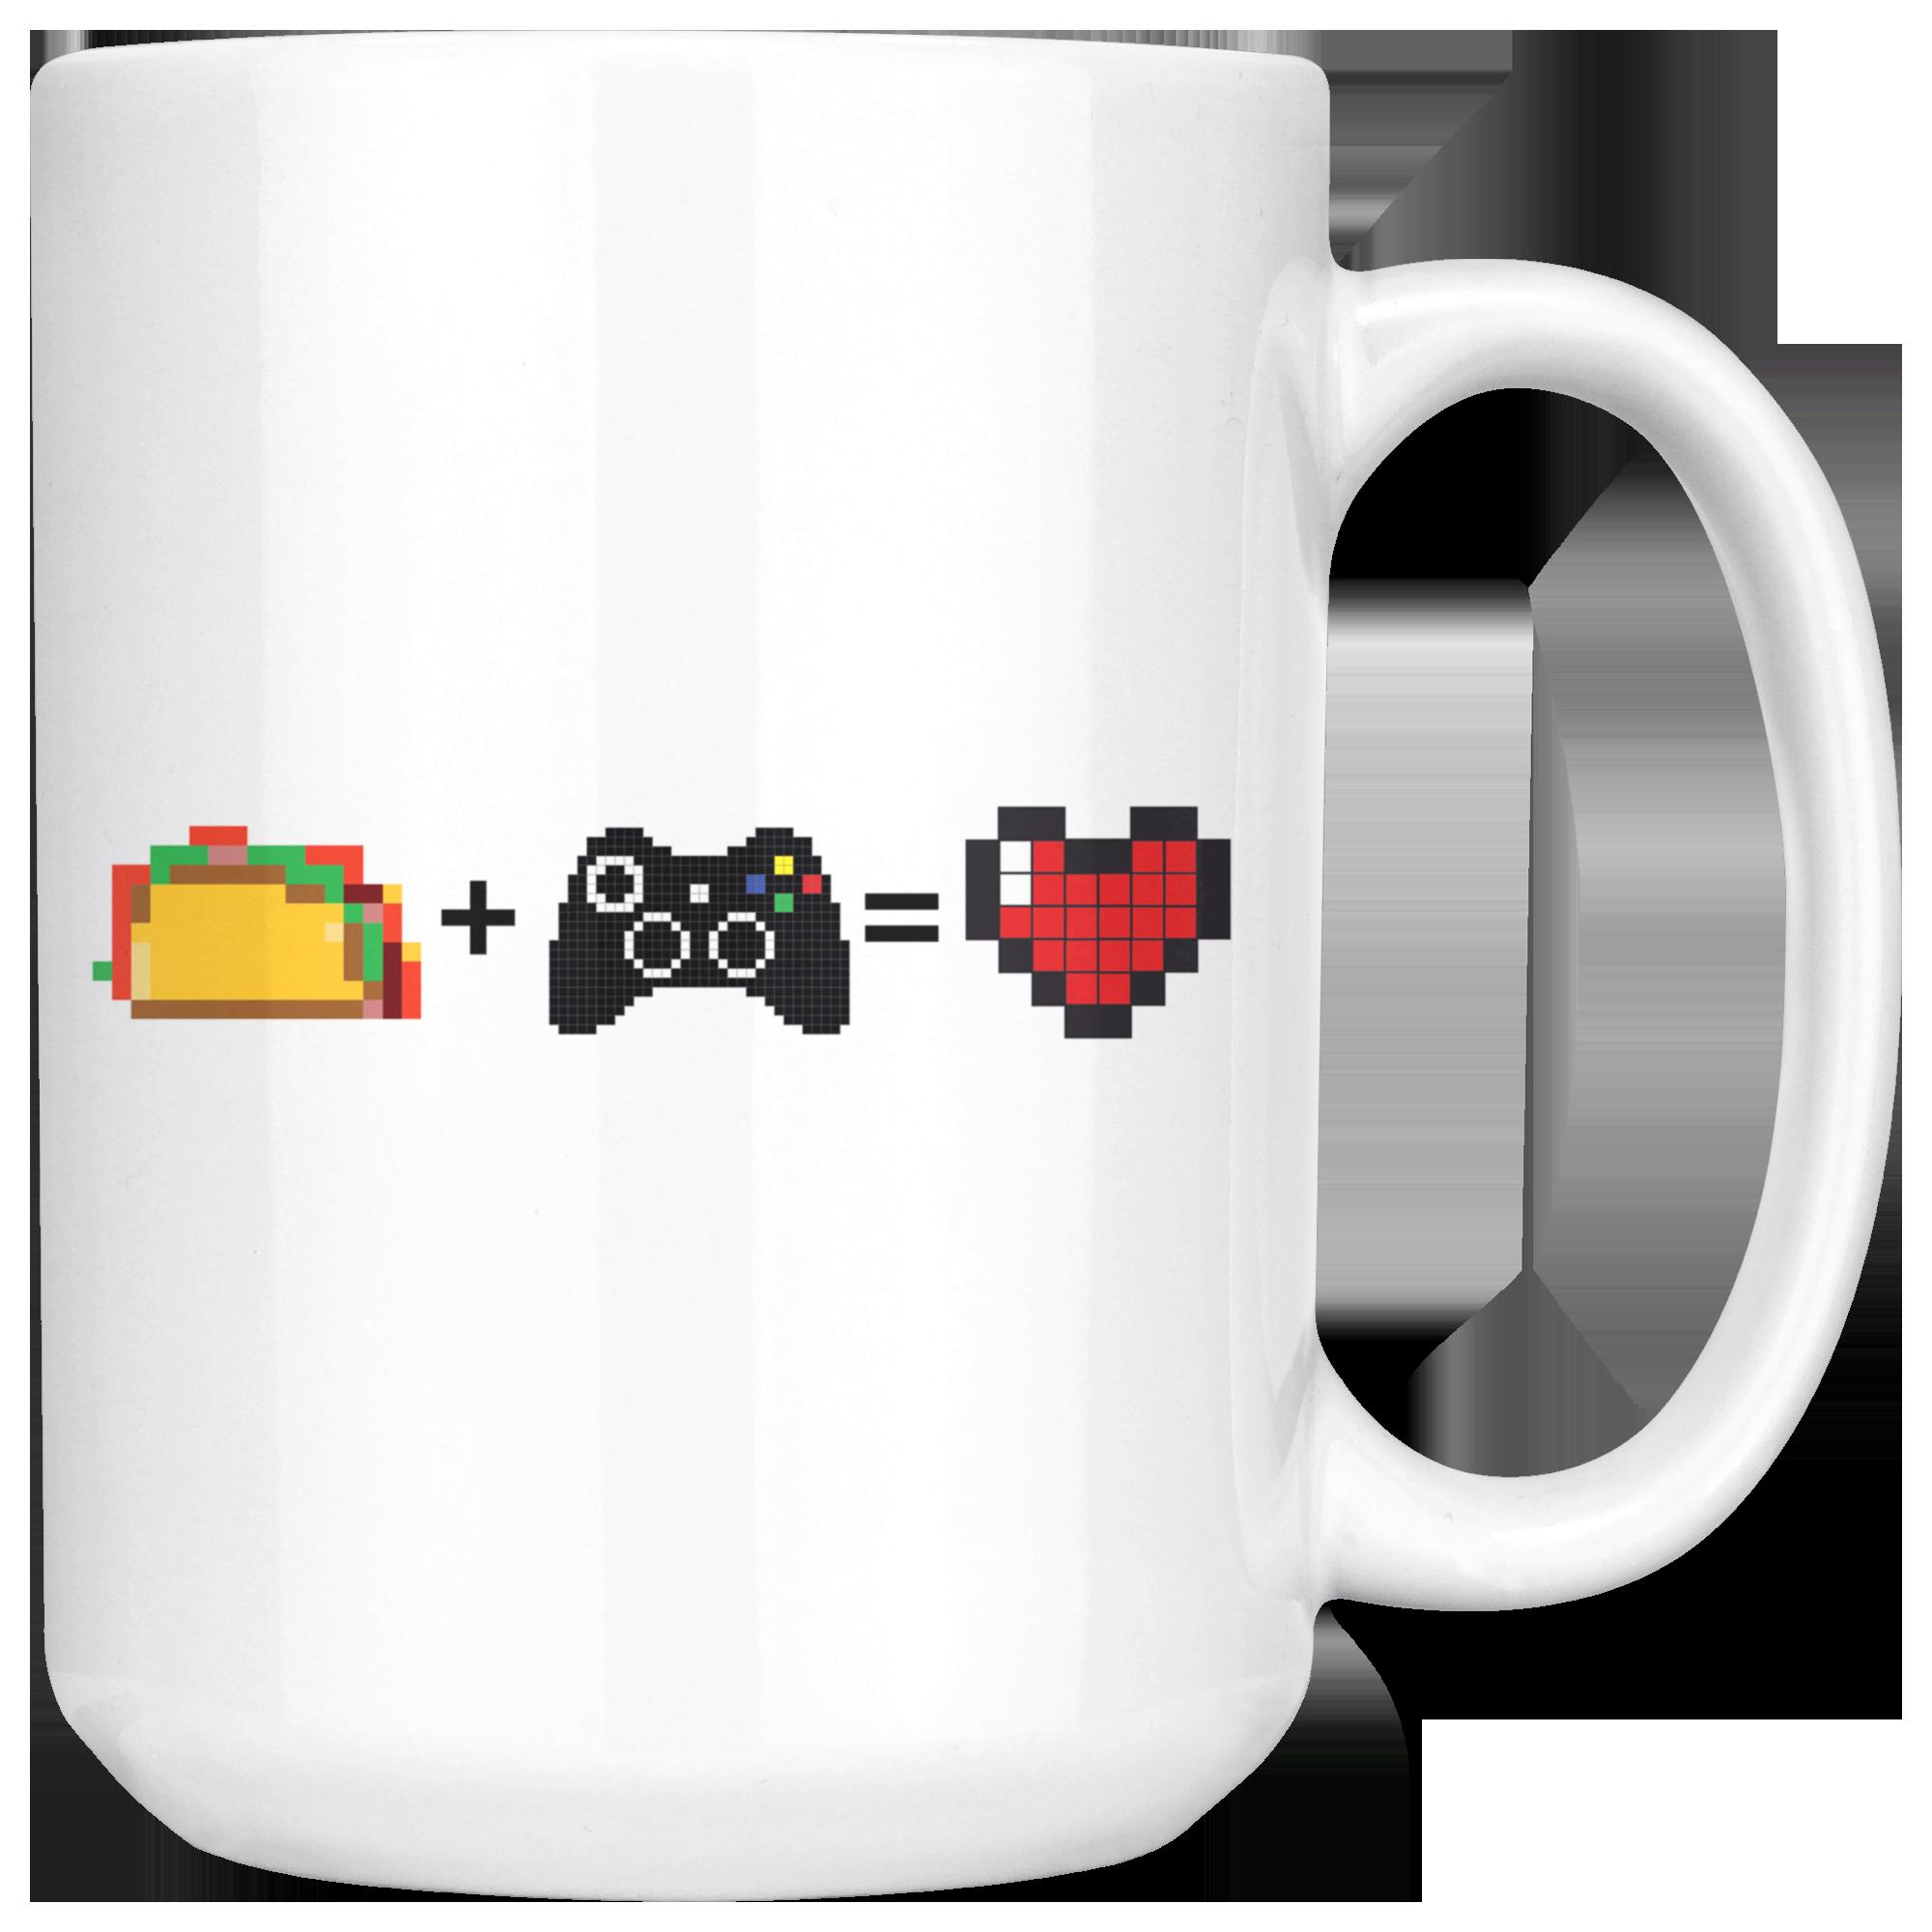 Food + Gaming = Love (Xbox Edition) Mug in 2019 | pottery | Mugs